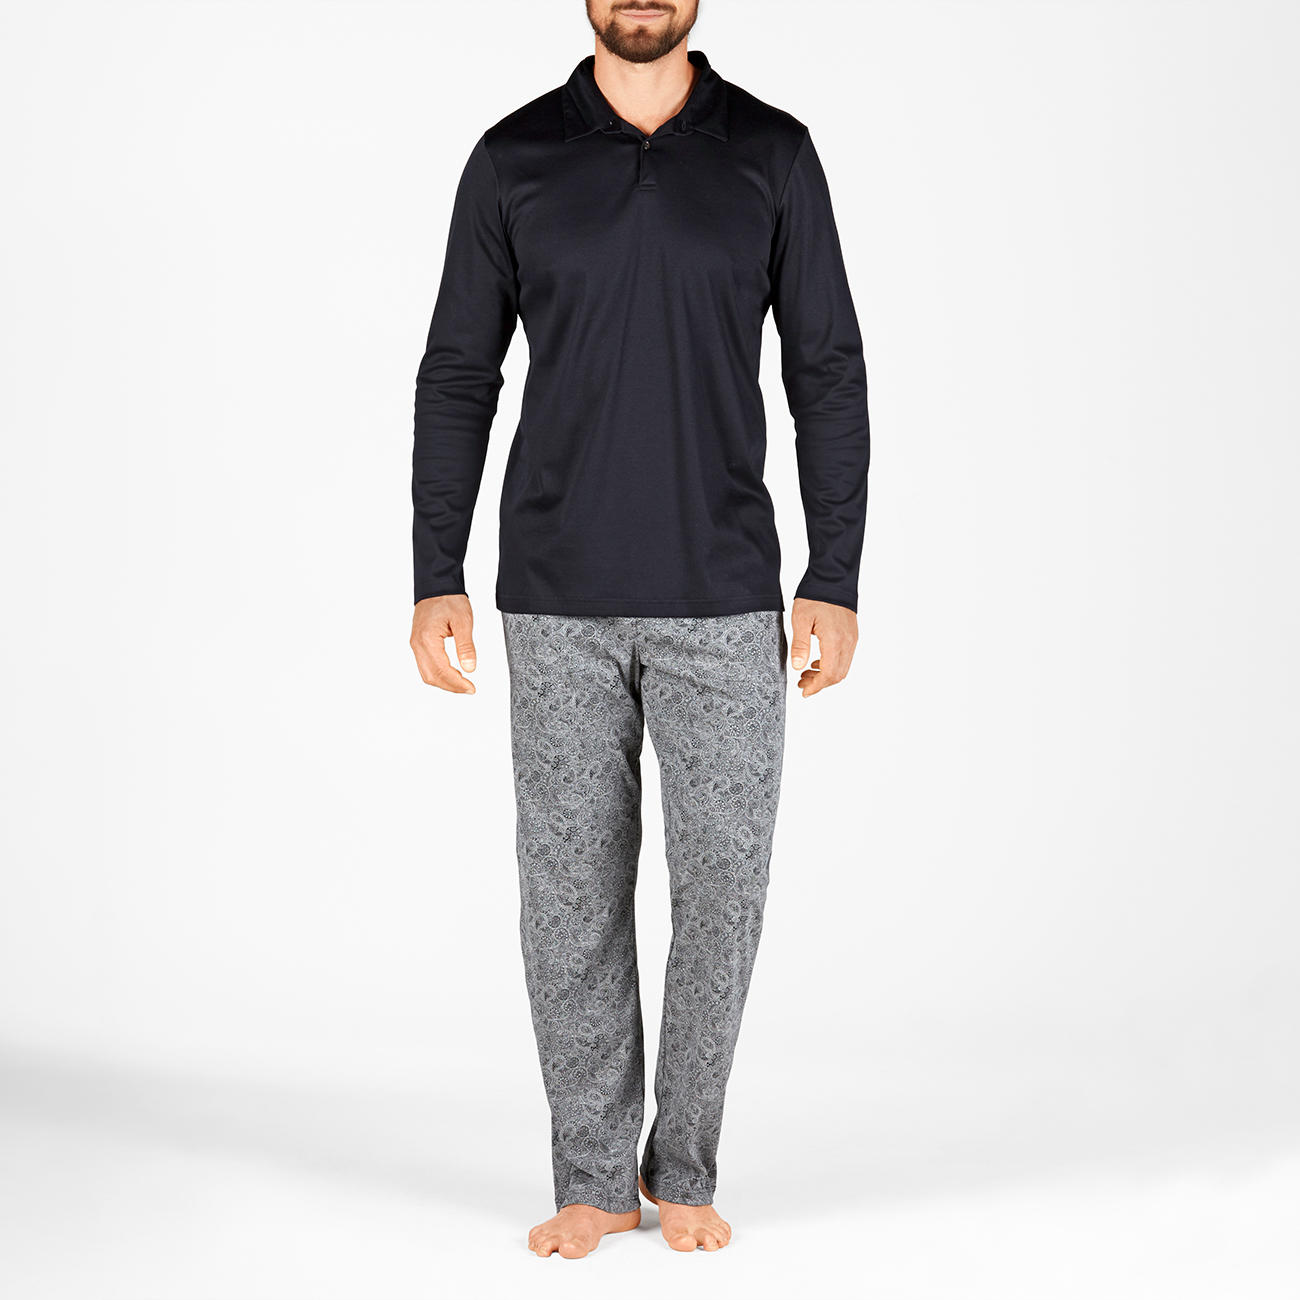 24f071590f Novila Gentlemen s Pyjamas - The perfect gentlemen s pyjamas. Comfortable.  Airy. Fine. From Novila.